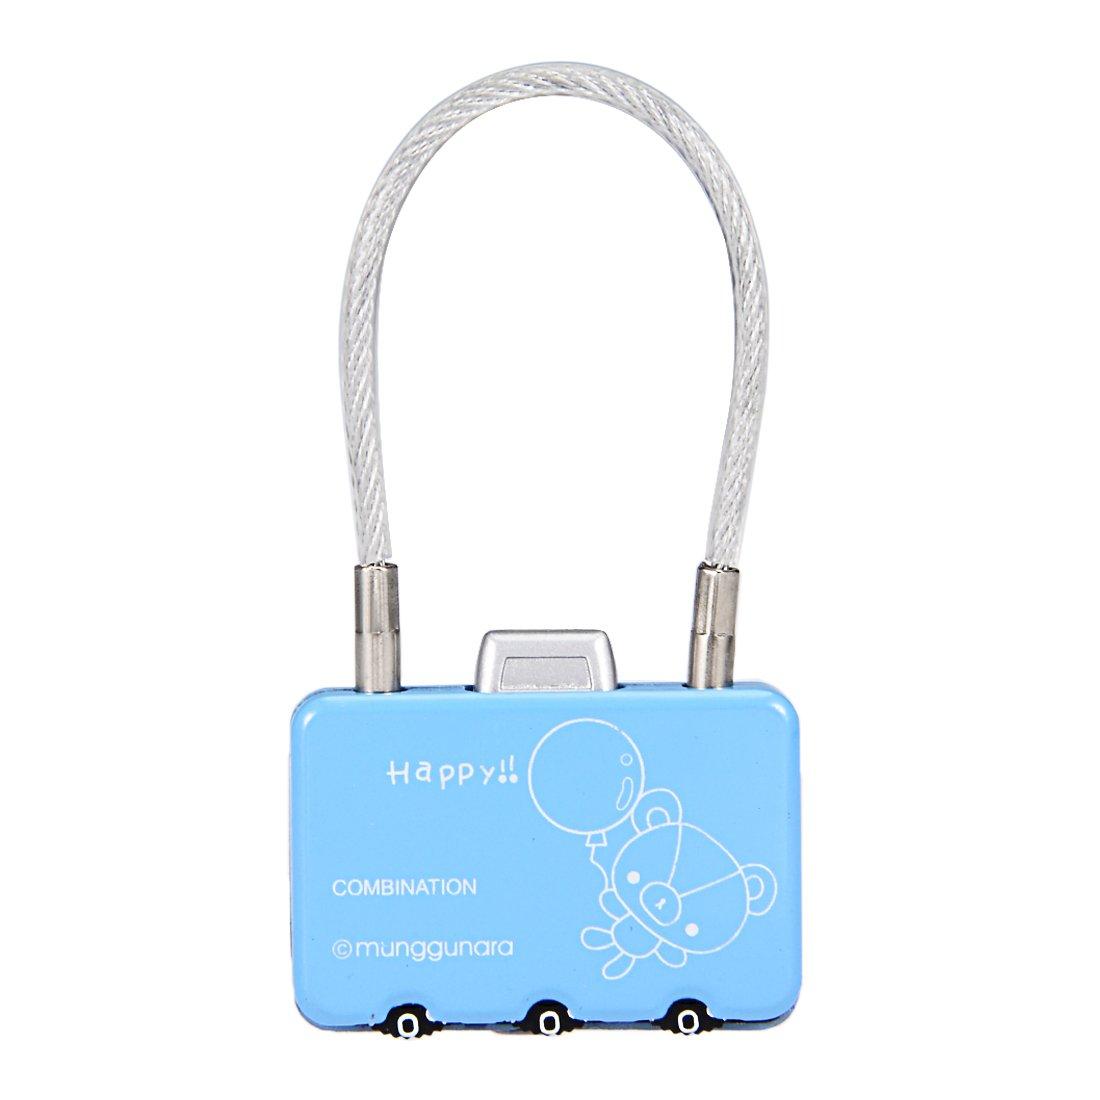 uxcell 3 Digit Association Padlock 3mm Wire Shackle Zinc Alloy Luggage Lock Blue